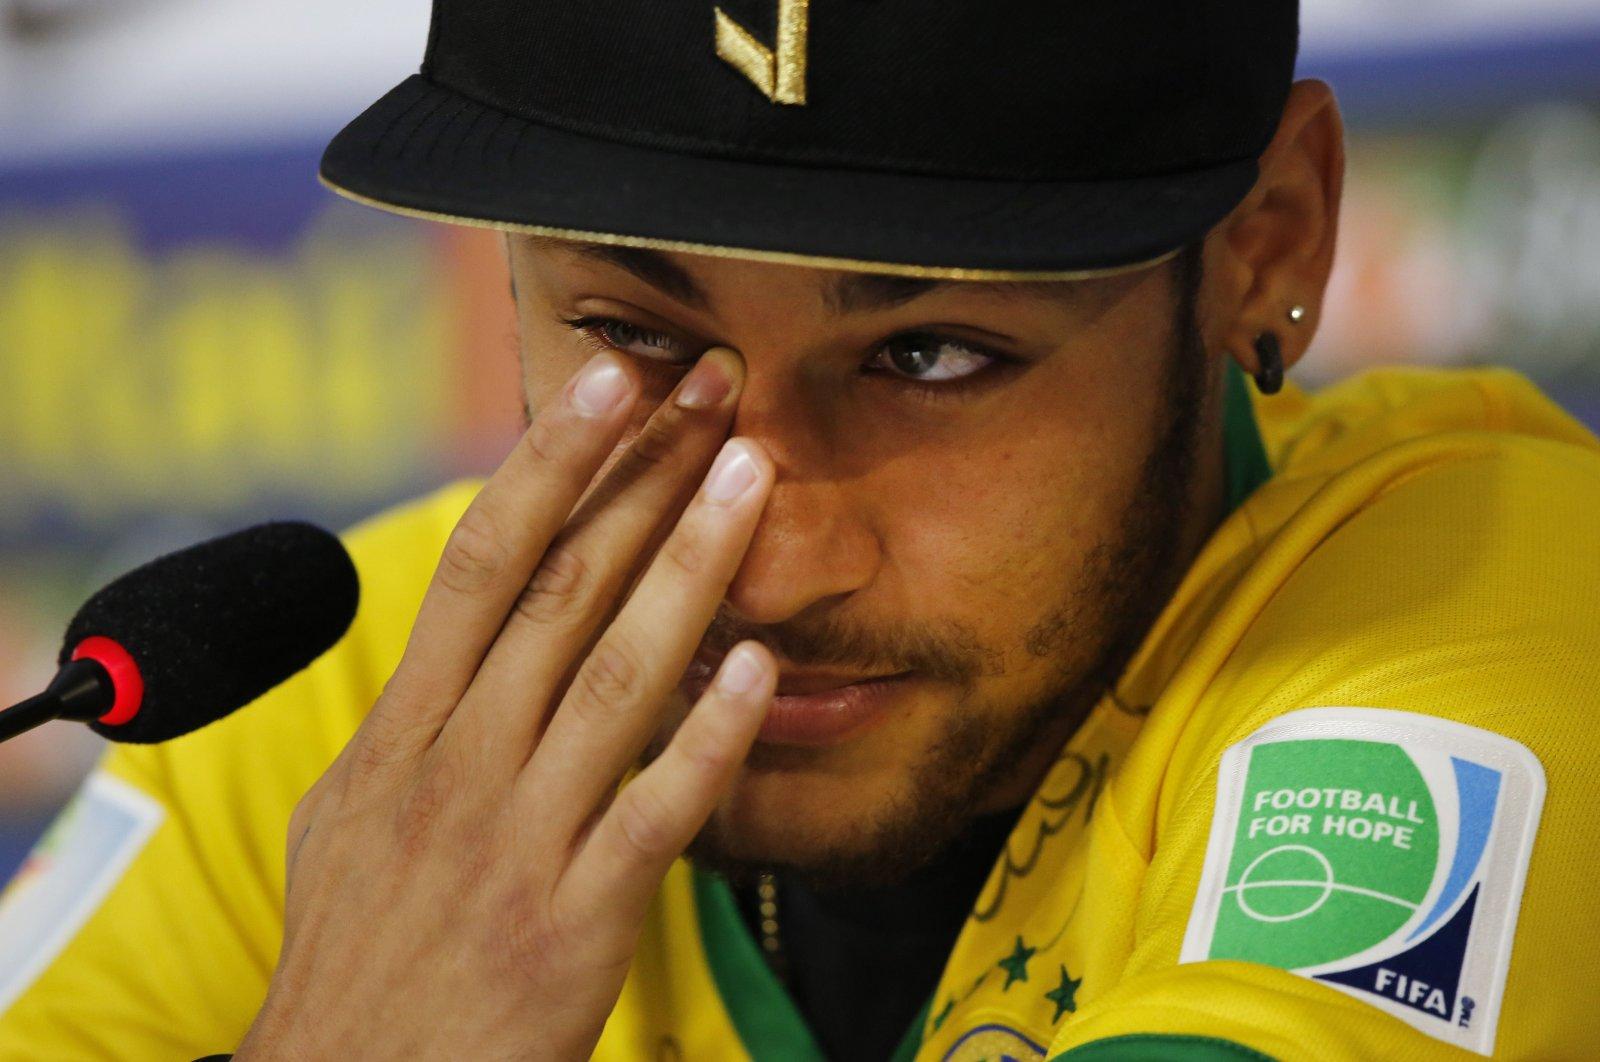 Then-injured Brazilian national football team player Neymar Jr. cries during a news conference in Teresopolis, near Rio de Janeiro, Brazil, July 10, 2014. (AP Photo)